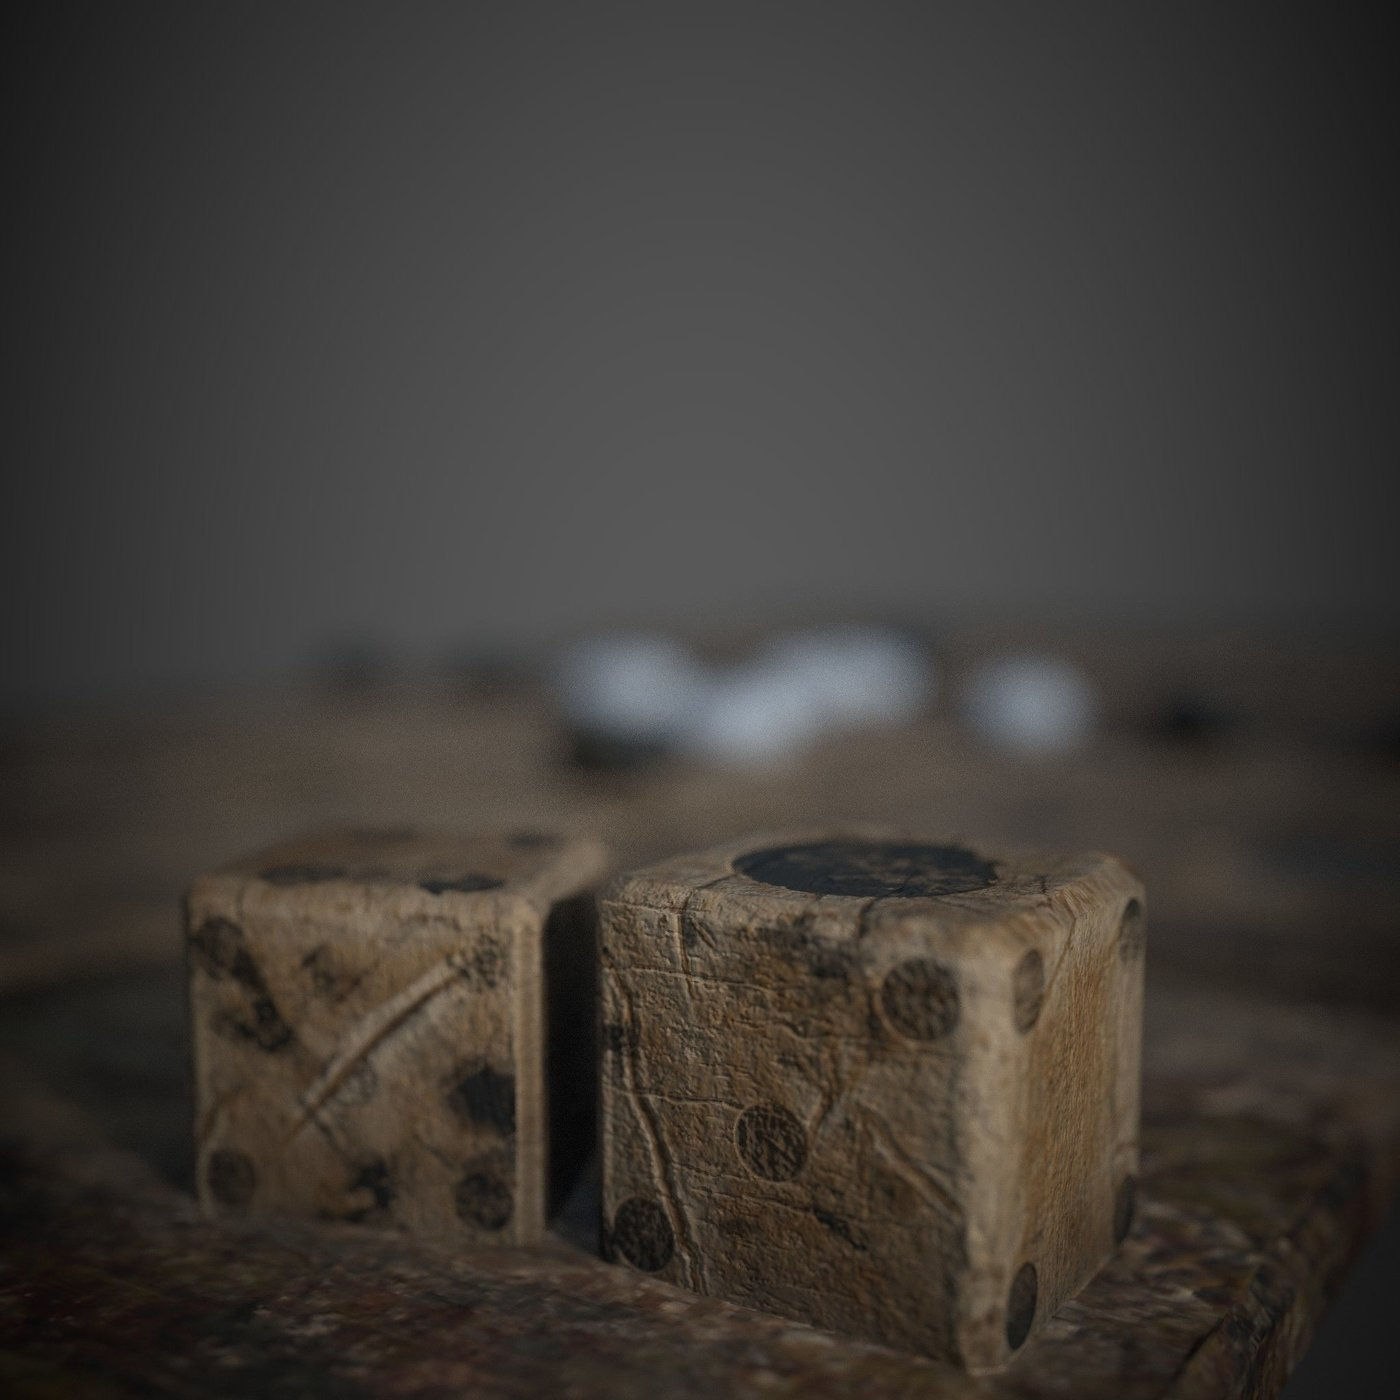 Medieval Board Game